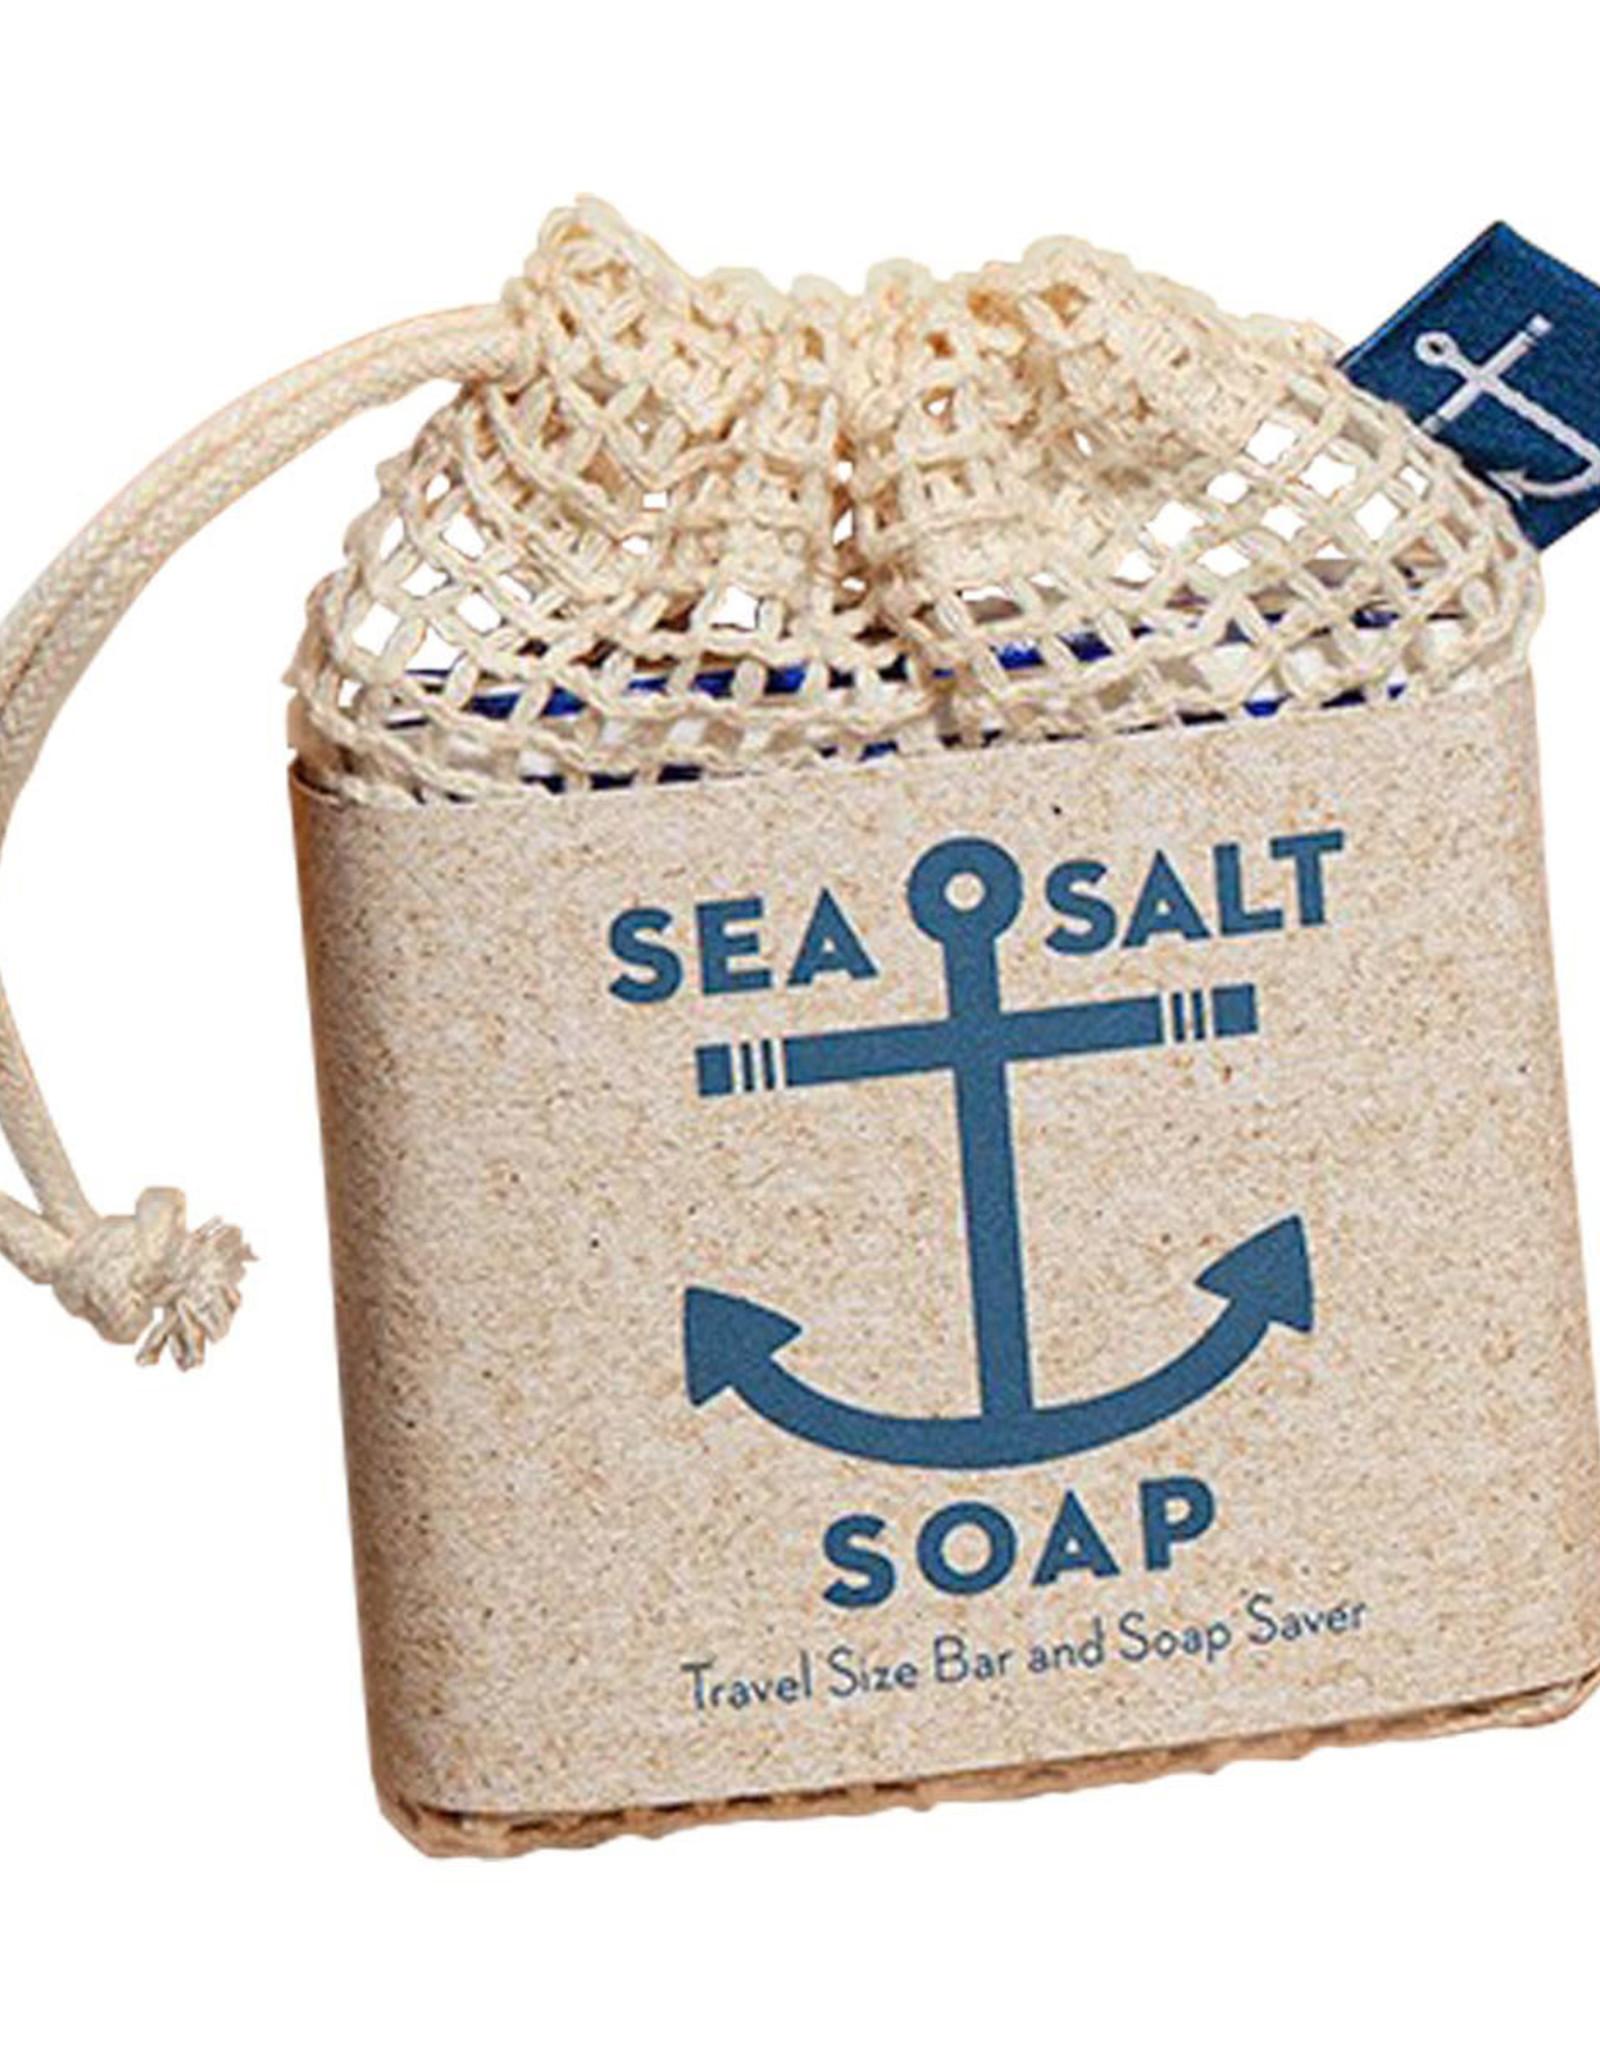 Sea Salt Travel Soap and Soap Saver